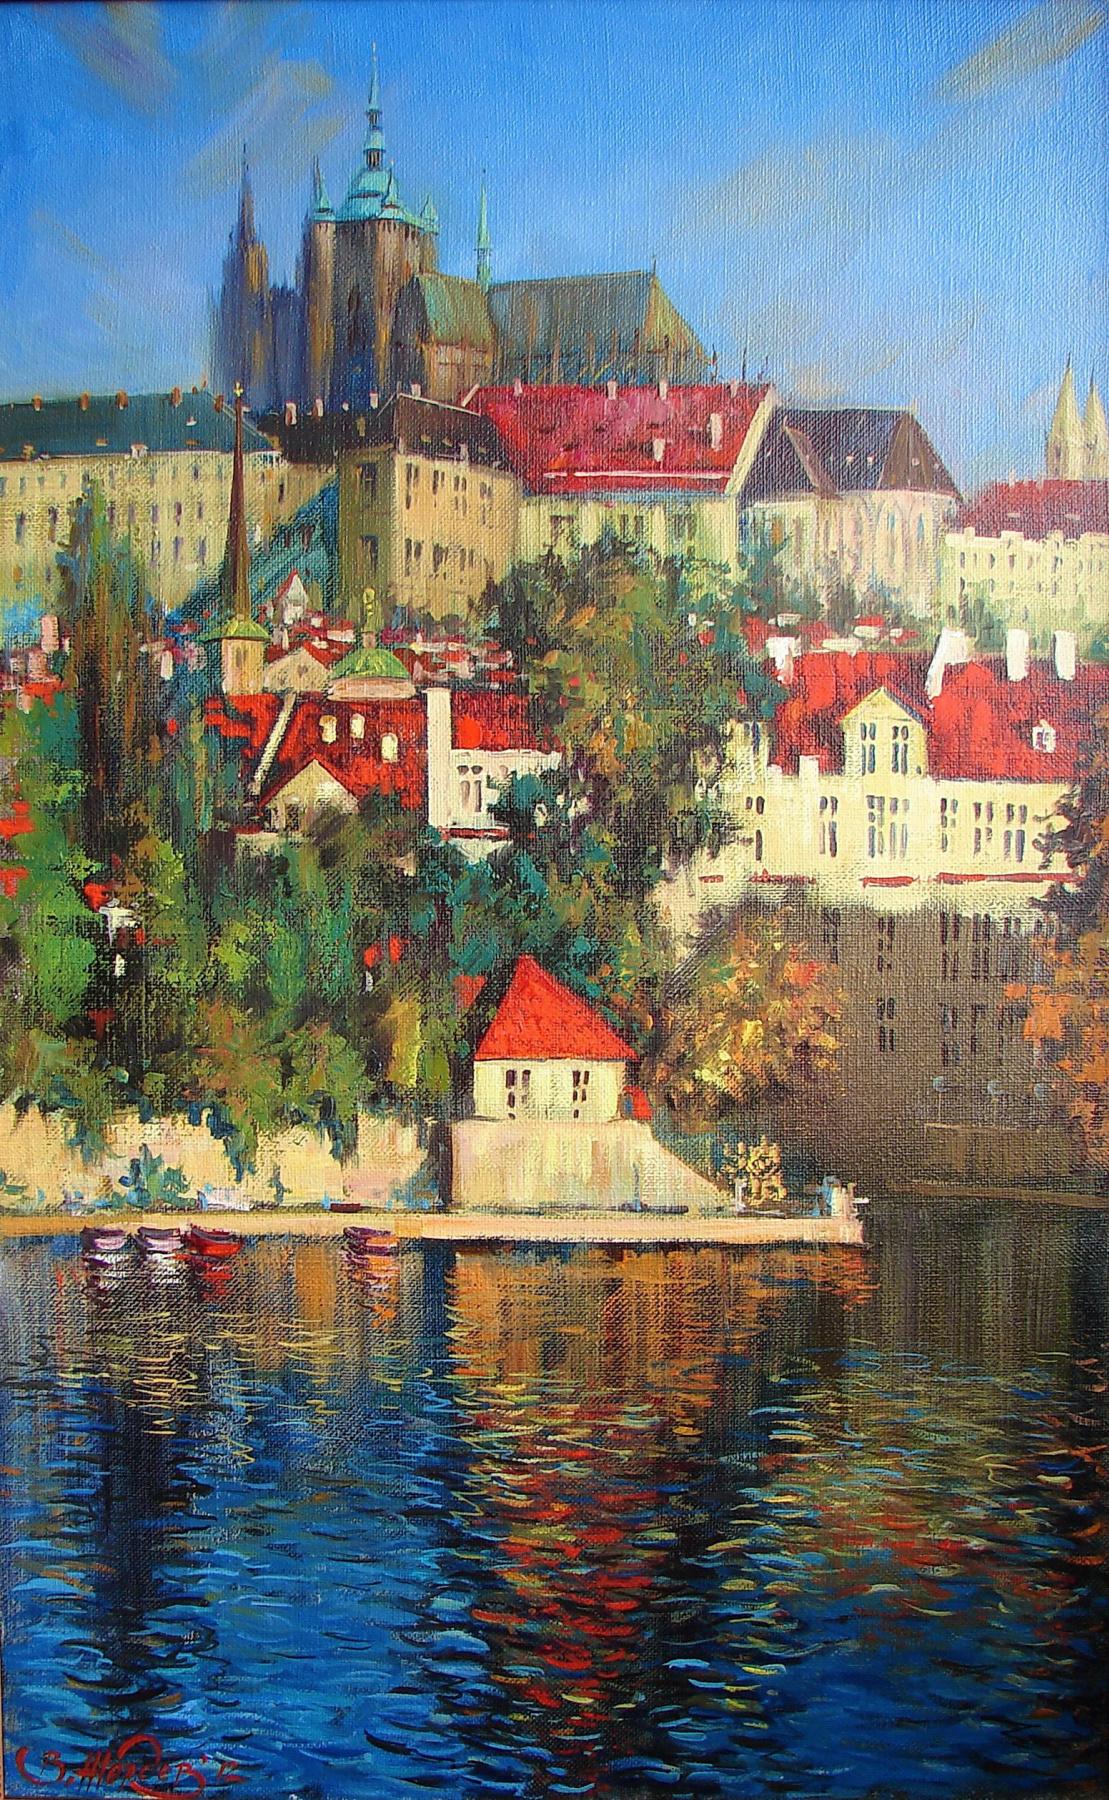 Виталий Викторович Жердев. Prague castle by Vitaliy Zherdev. 2012, 105x65 cm. Oil on canvas.